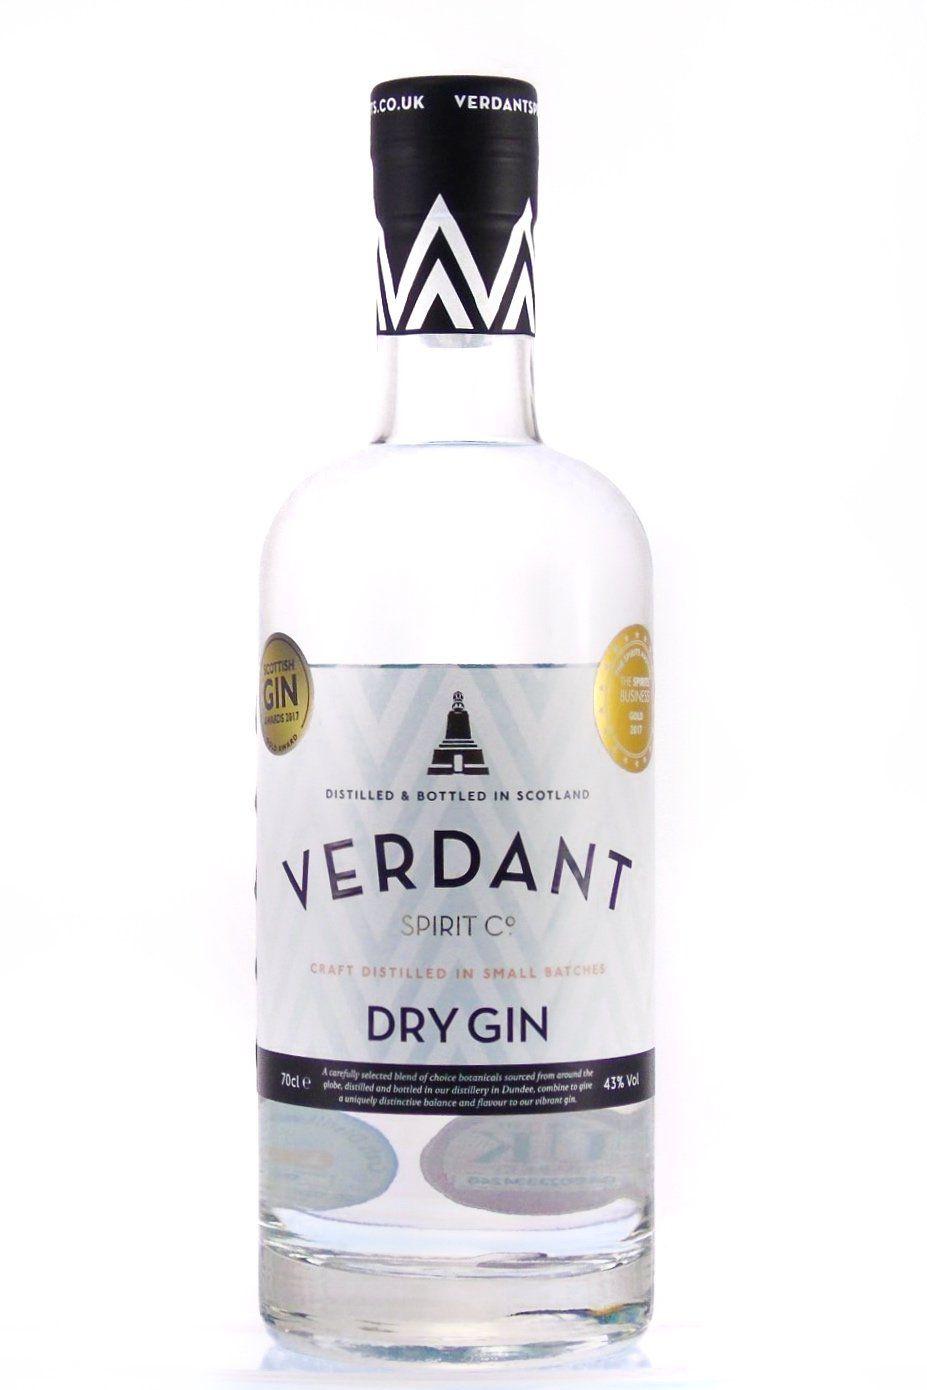 Verdant Dry Gin